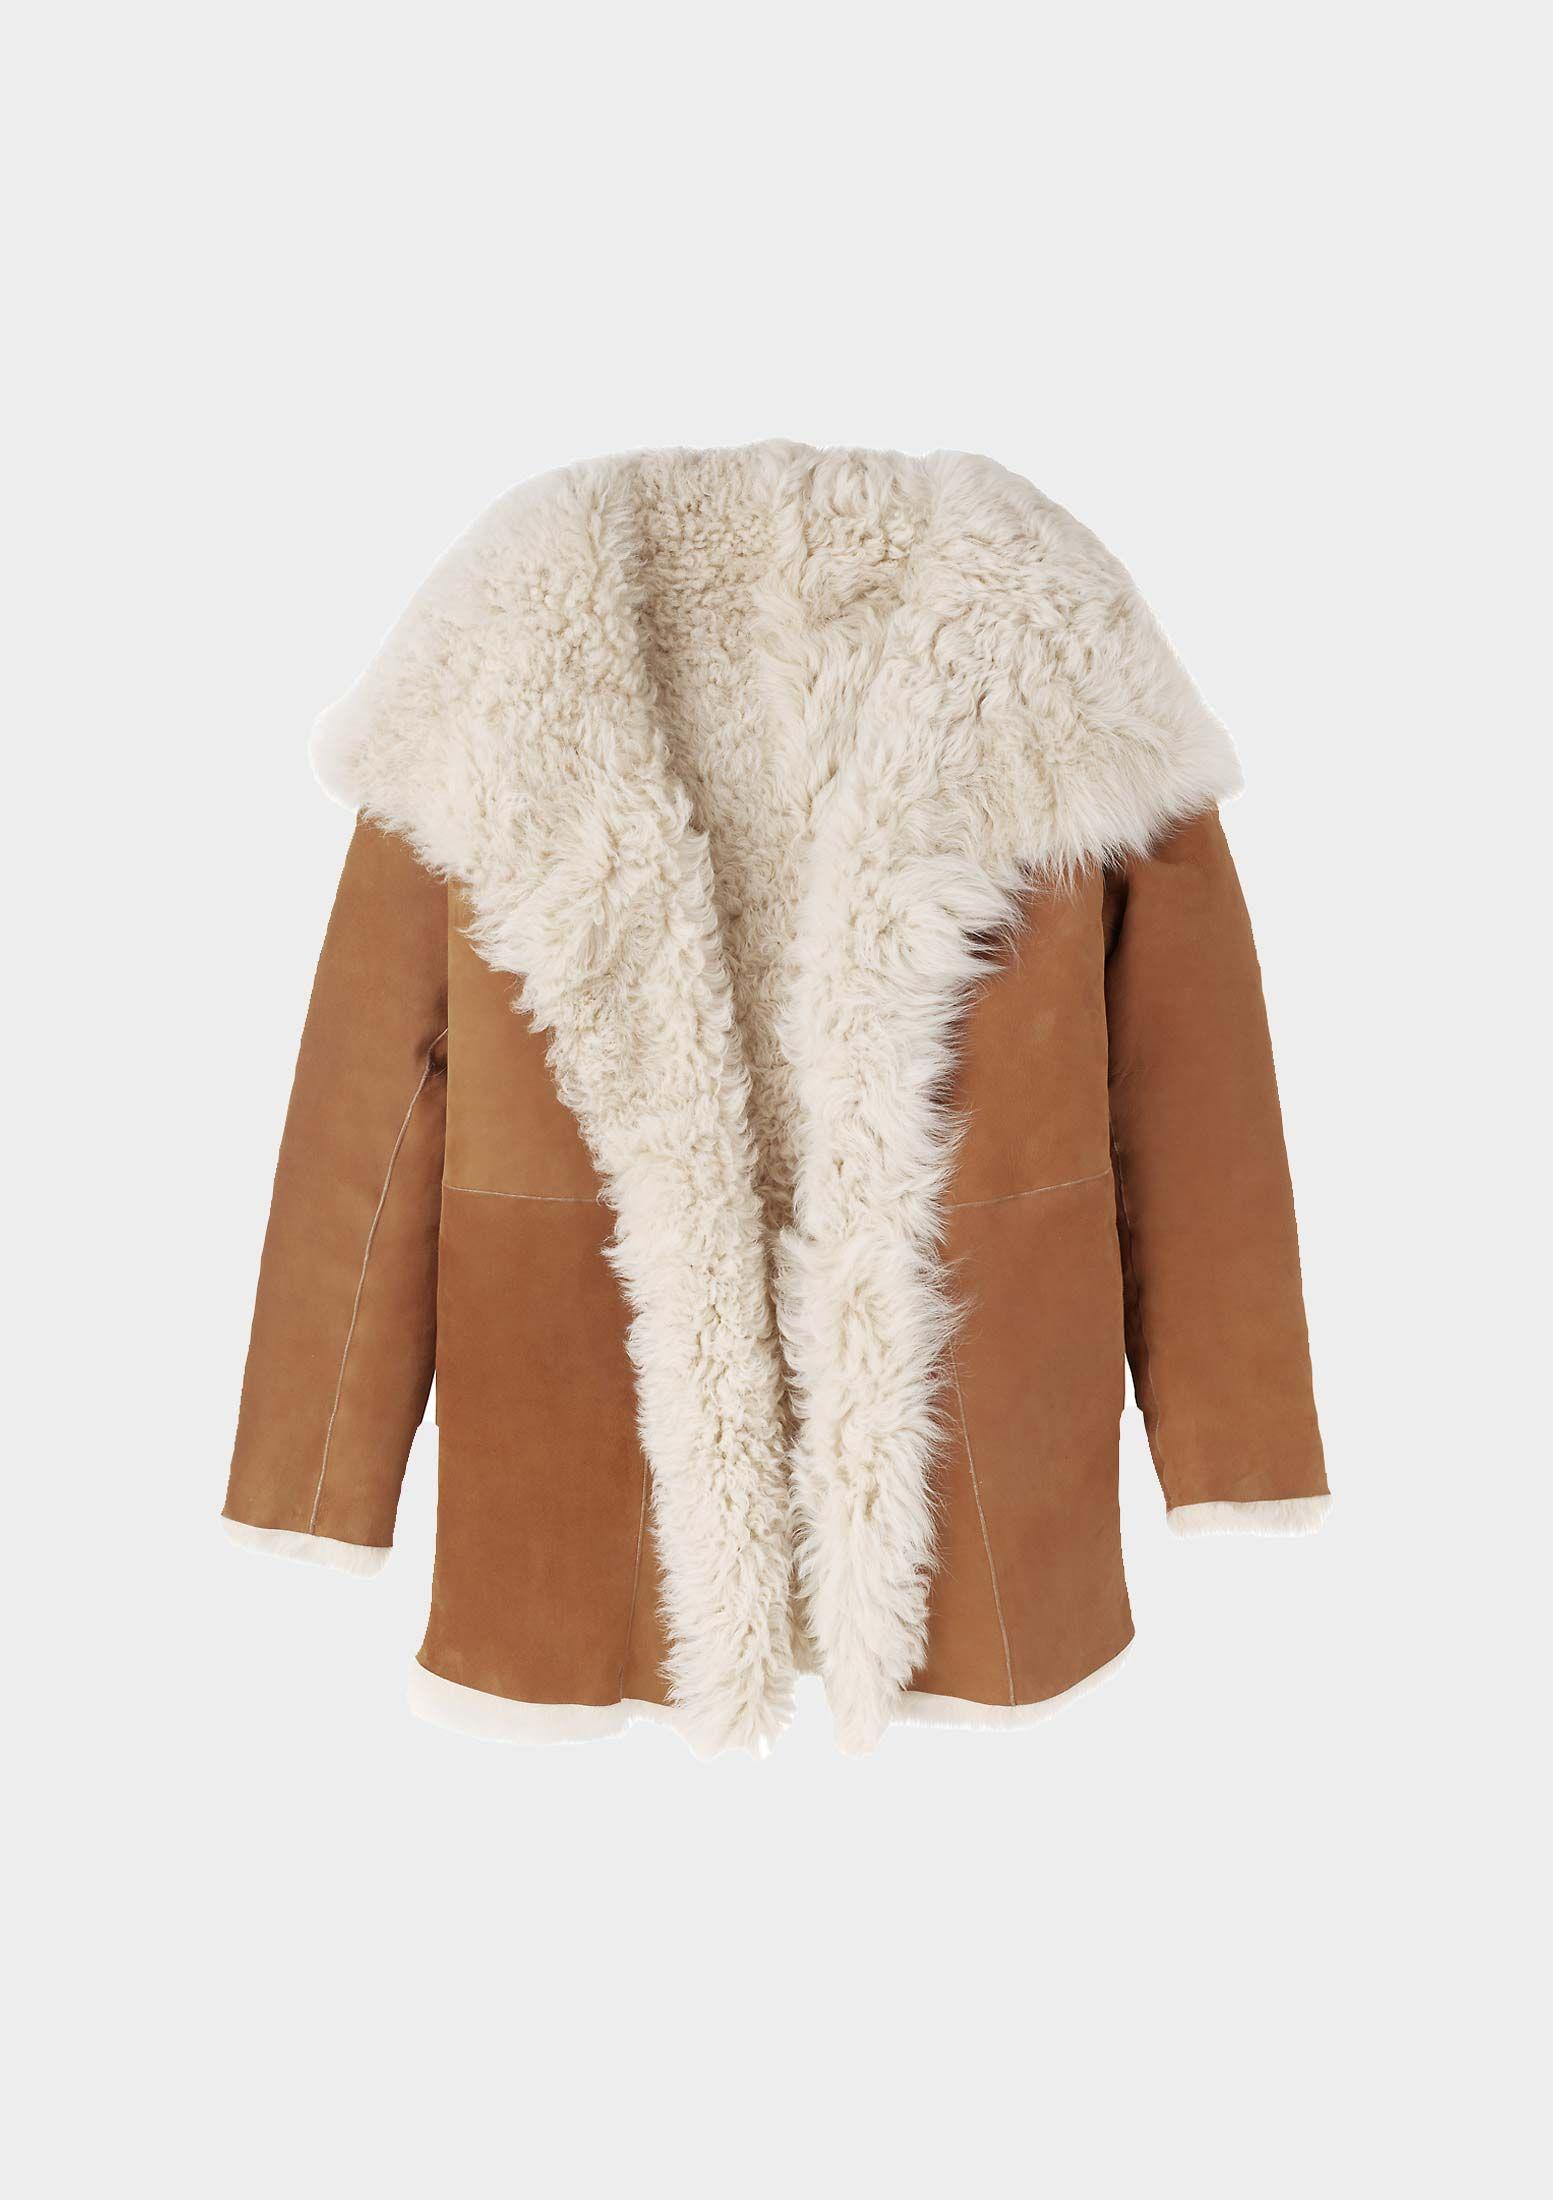 SHEARLING WRAP COAT TOAST Coat, Clothes, Lounge wear